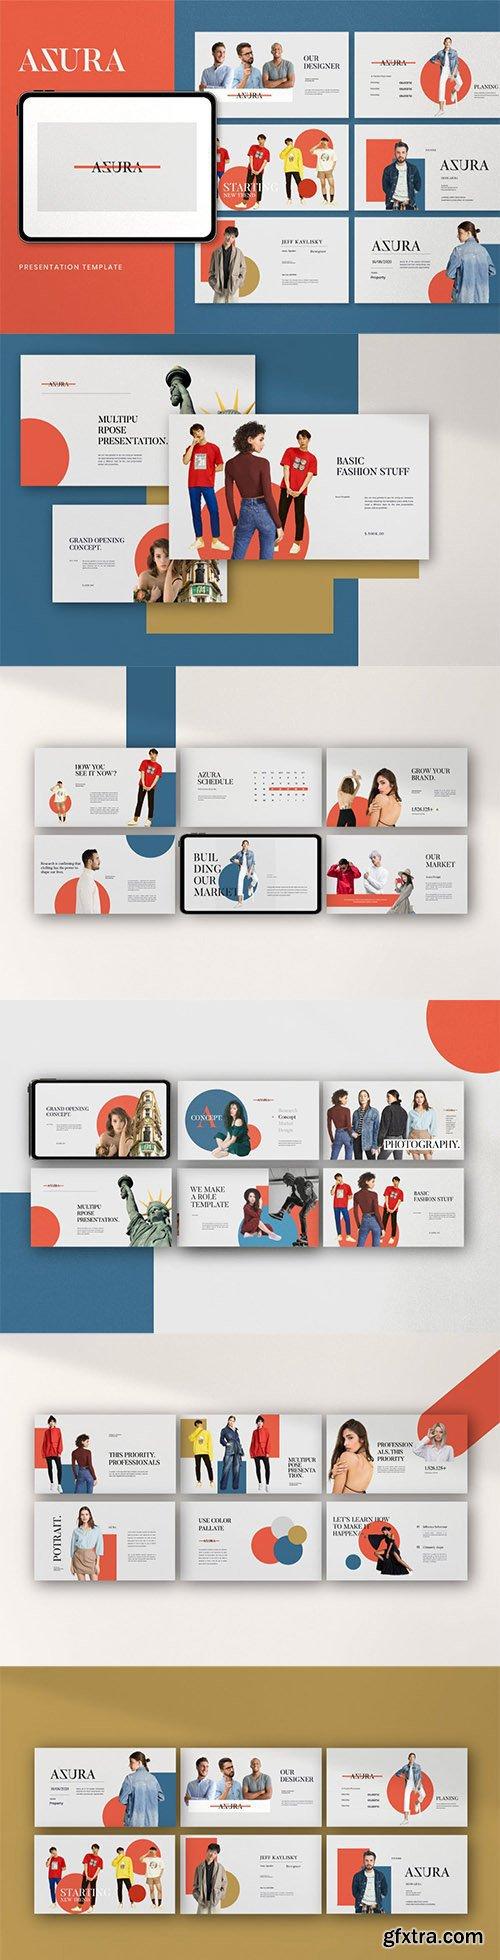 Azura - Minimal Fashion Keynotes